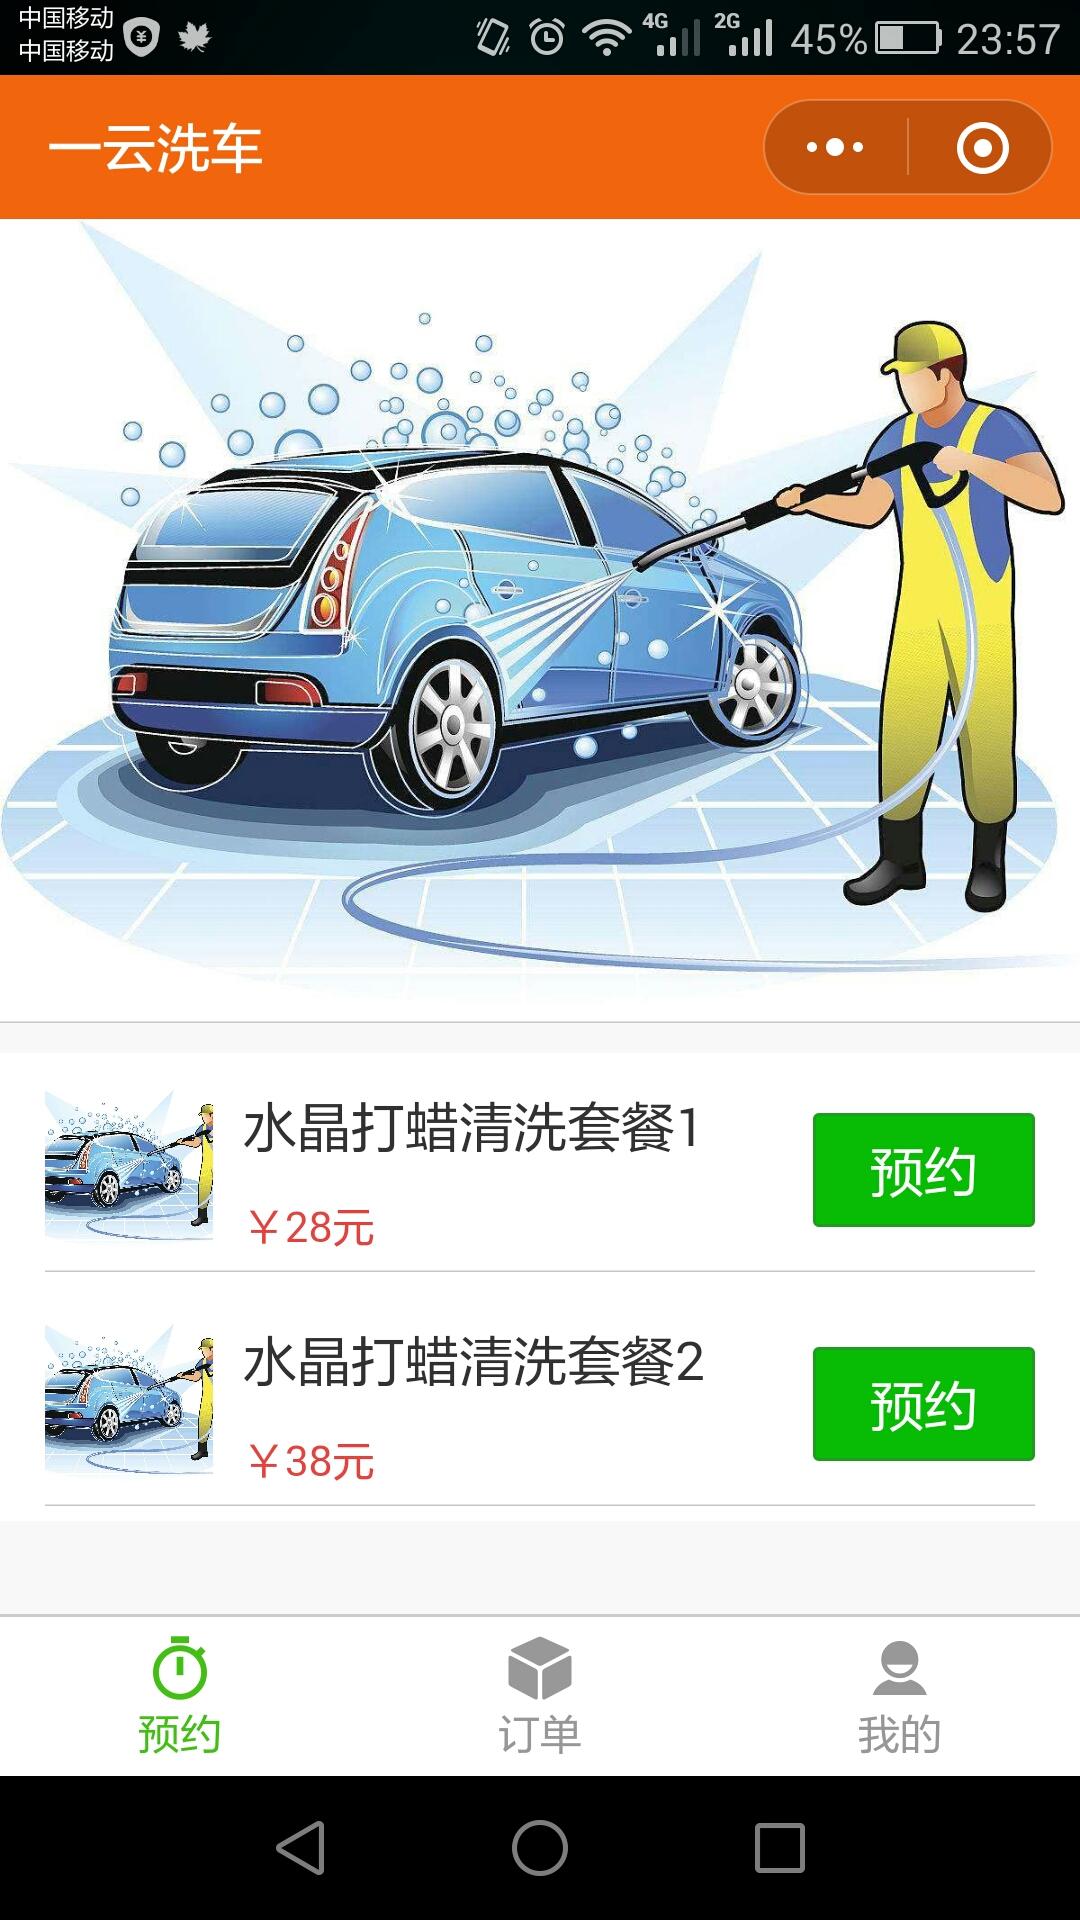 O2O洗车[预约]小程序模板